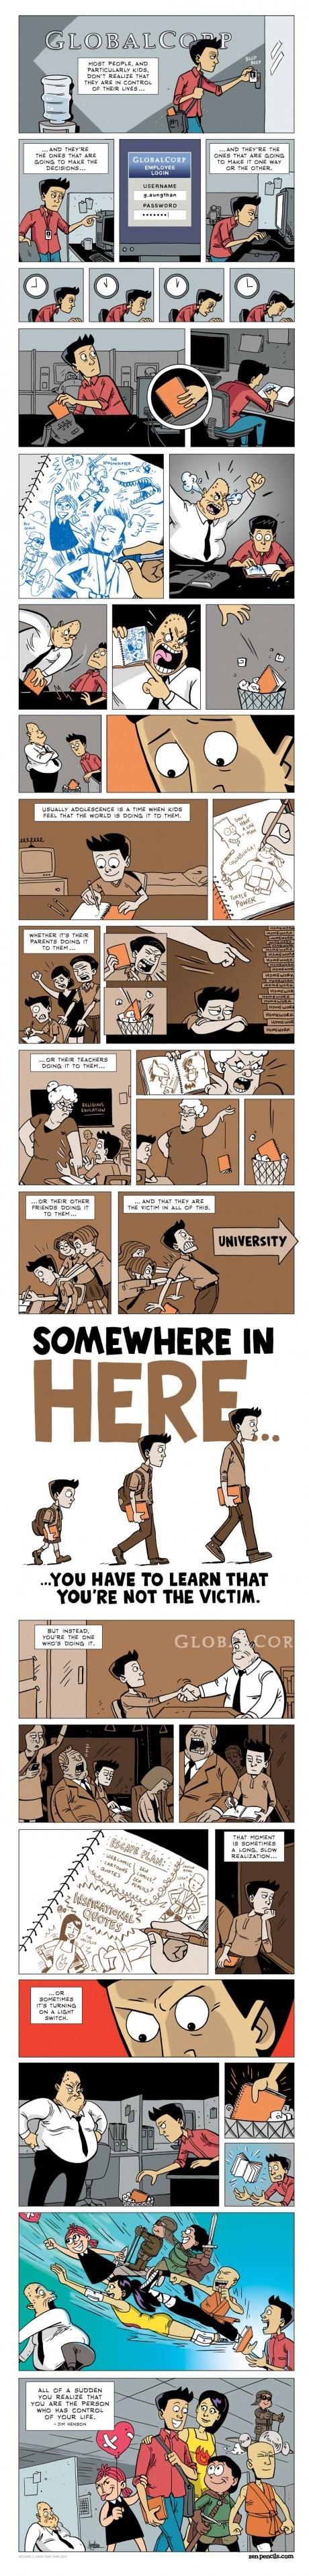 advice jim henson web comics - 8179990528